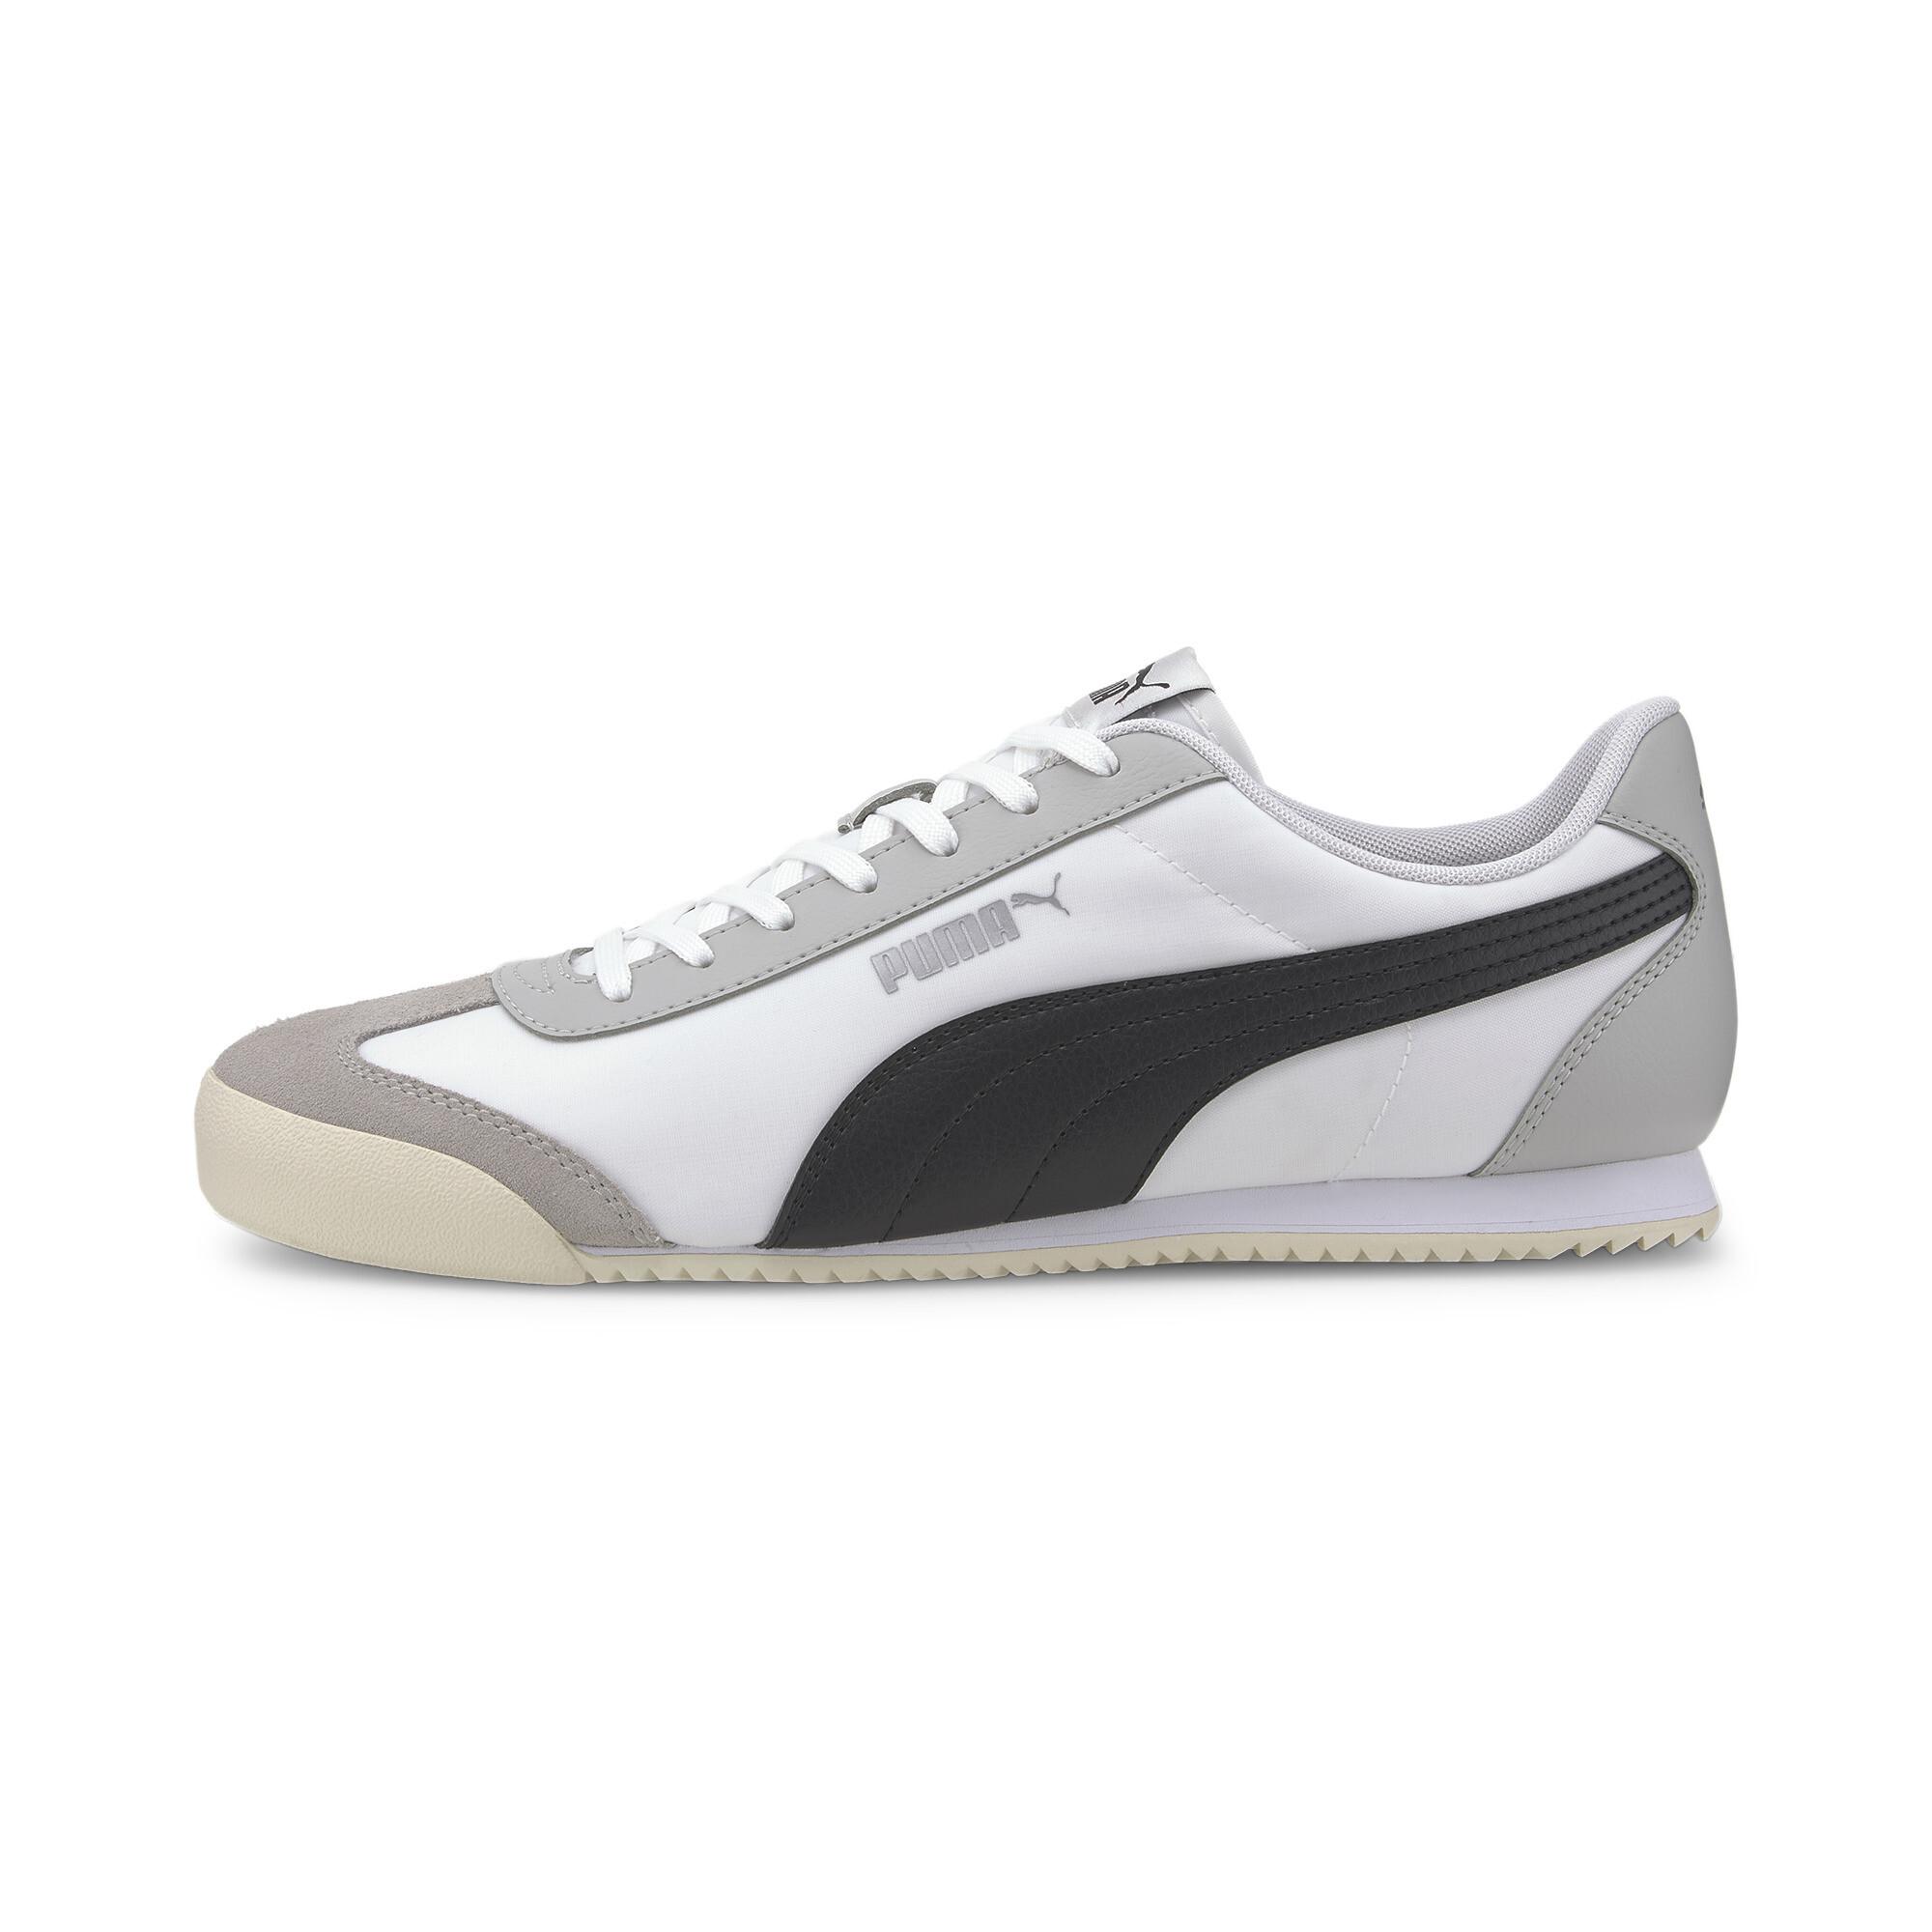 PUMA-Men-039-s-Turino-NL-Sneakers thumbnail 4